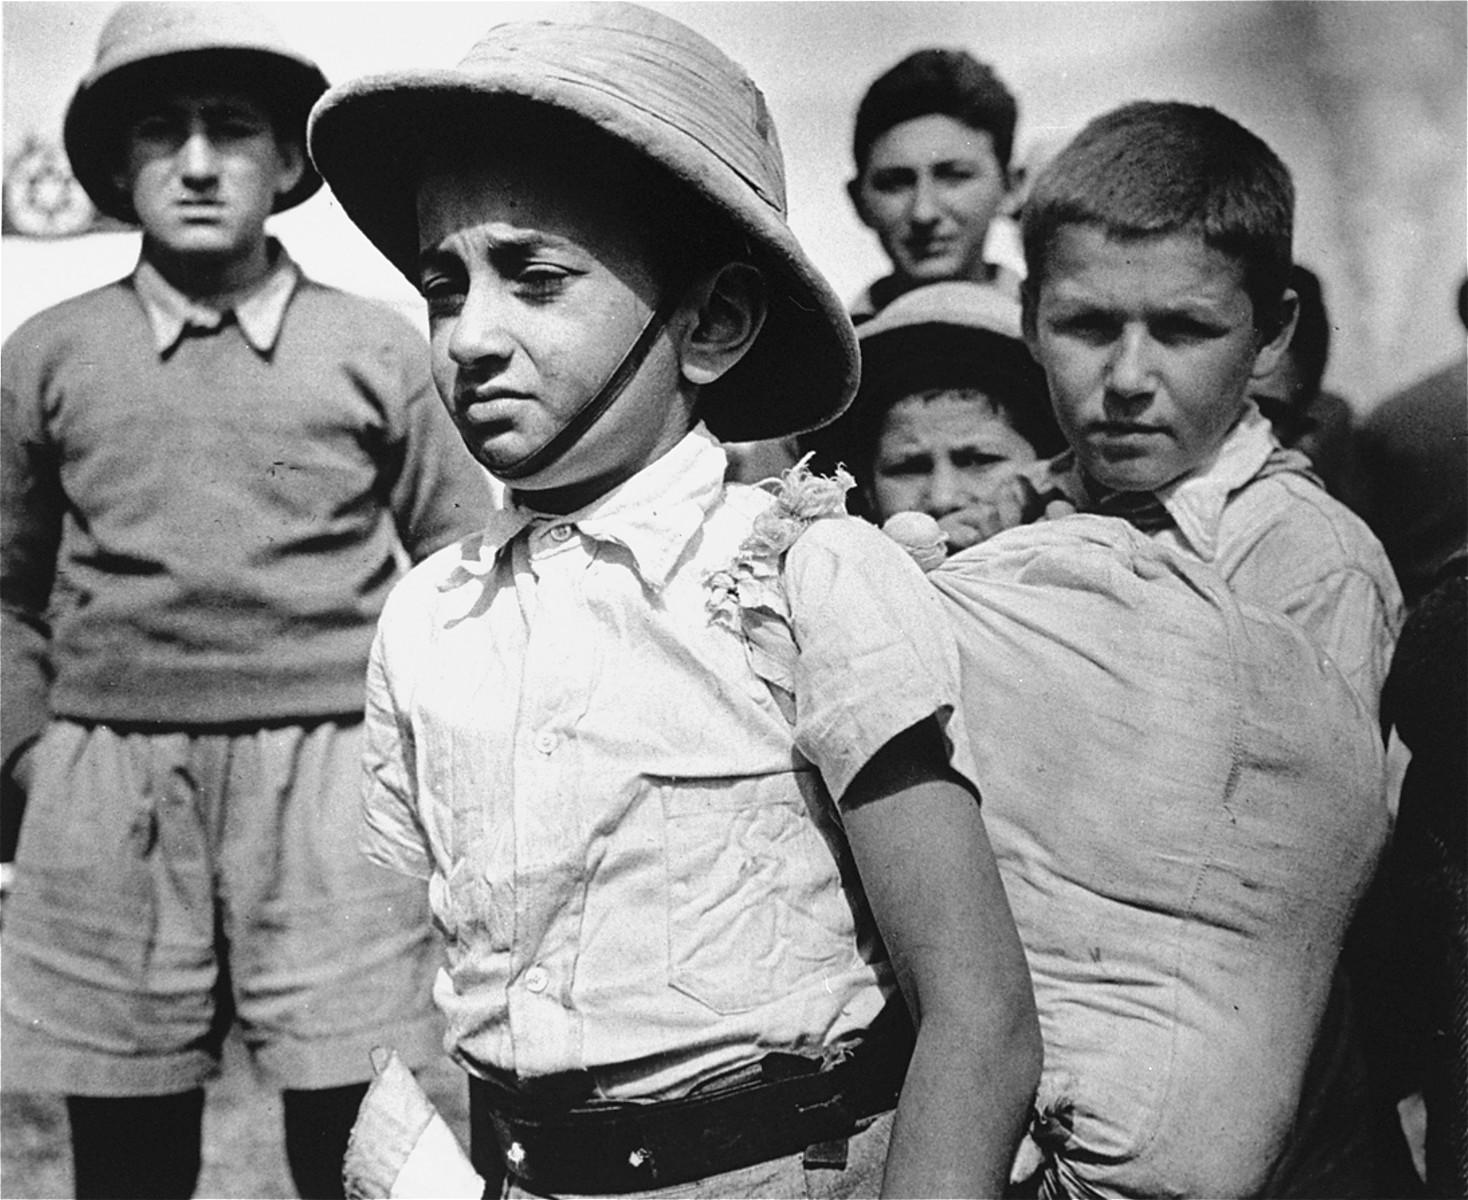 Members of the Teheran children's transport arrive in Athlit.